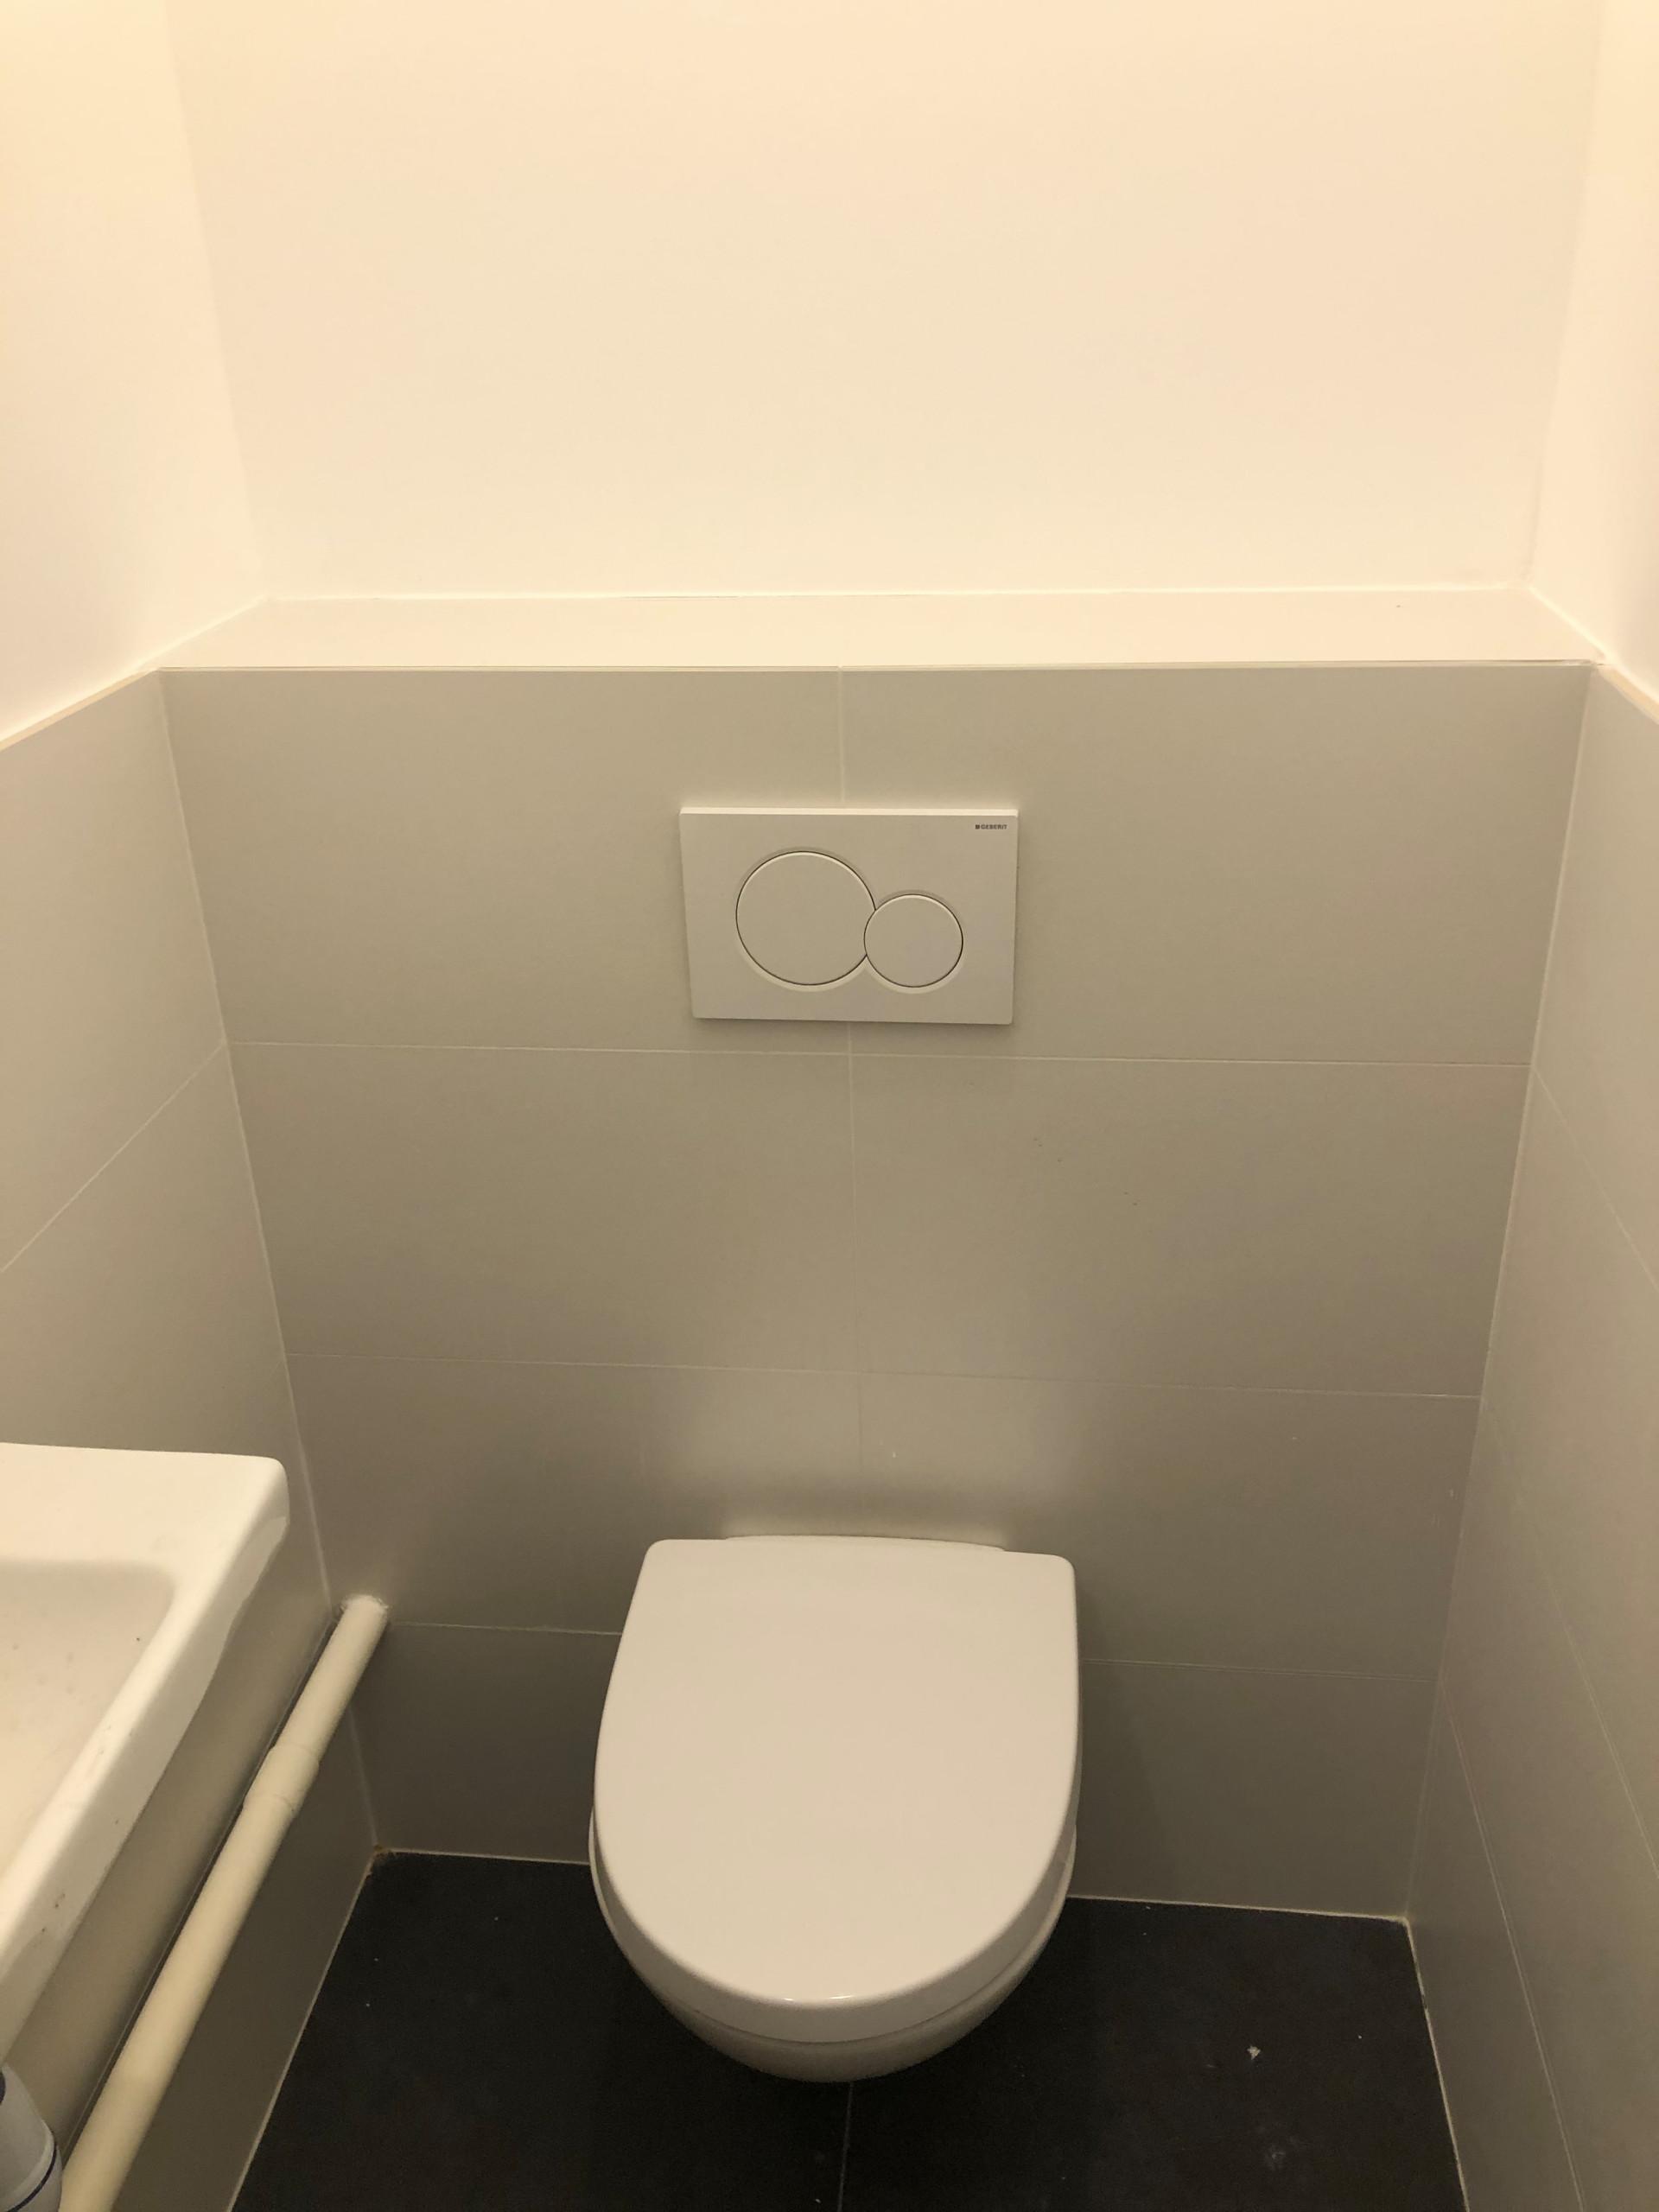 Les toilettes avant